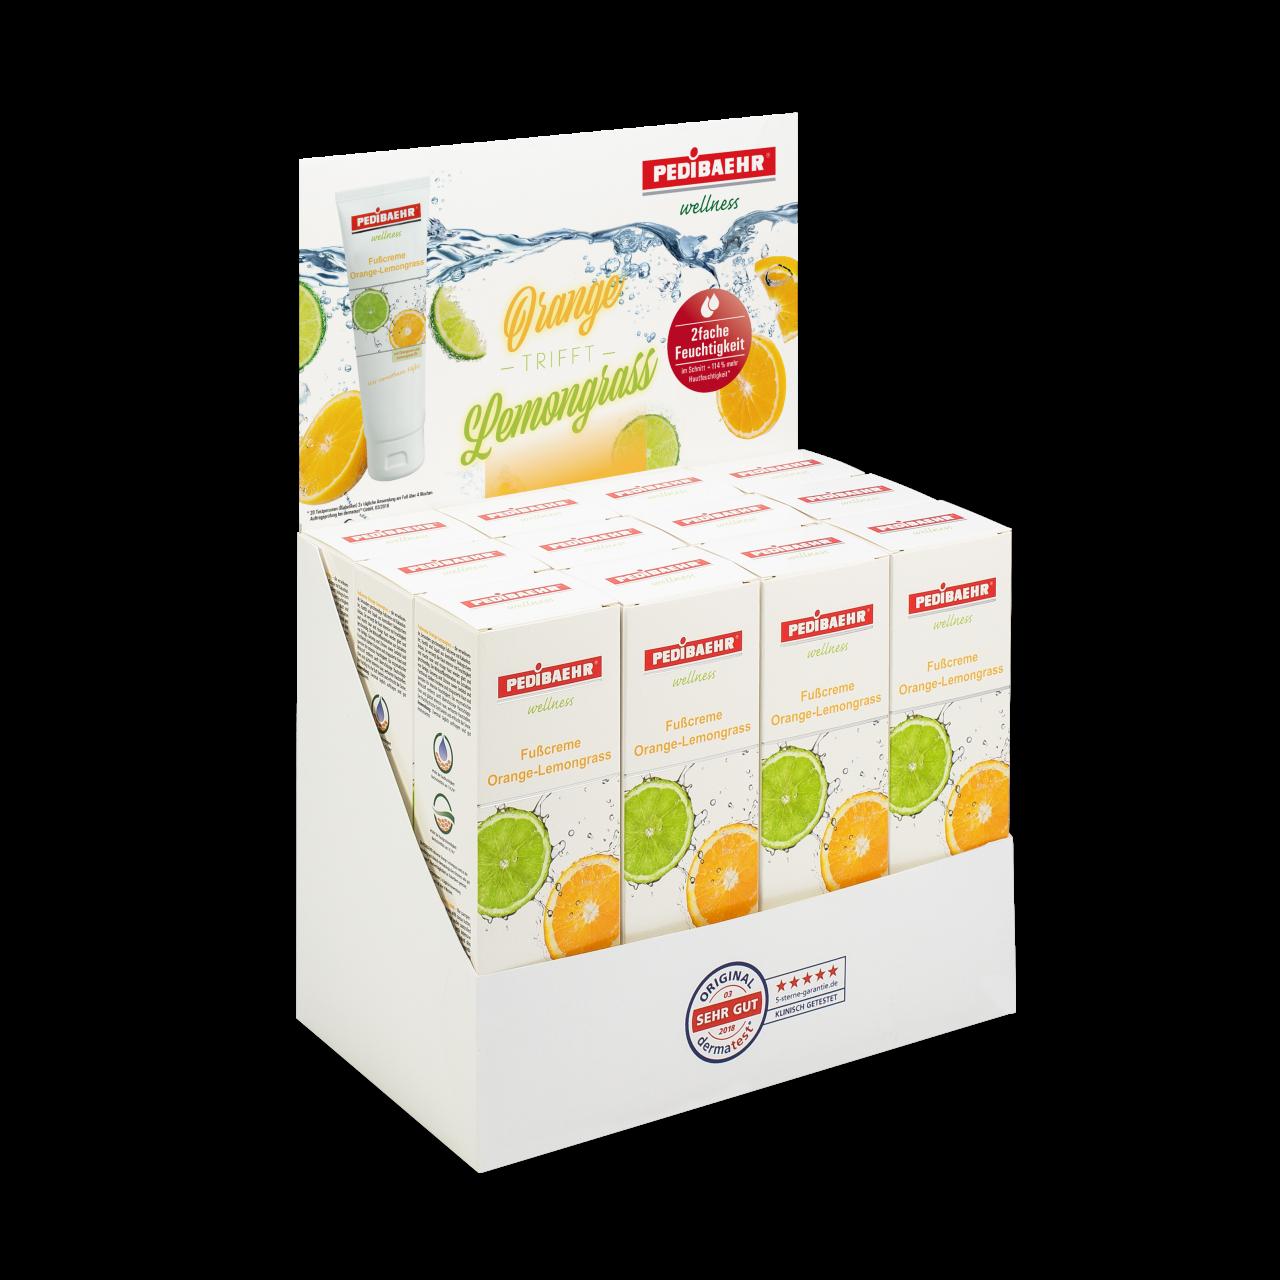 Aktionspaket Fußcreme Orange/Lemongrass 125 ml